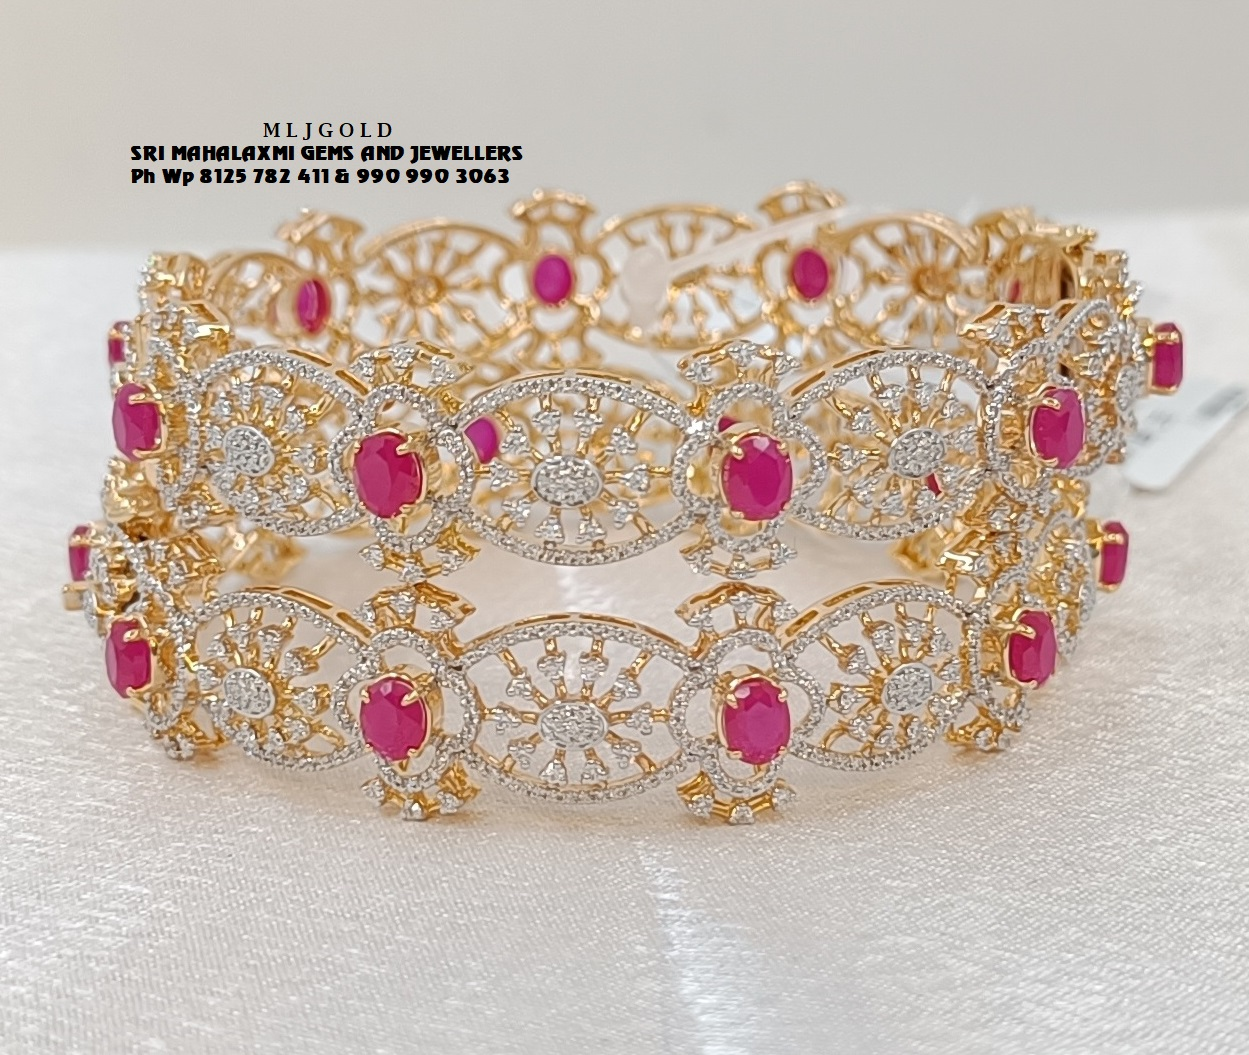 Presenting Bangles studded with IGI certified VVS EF finest quality diamonds. 2021-10-15